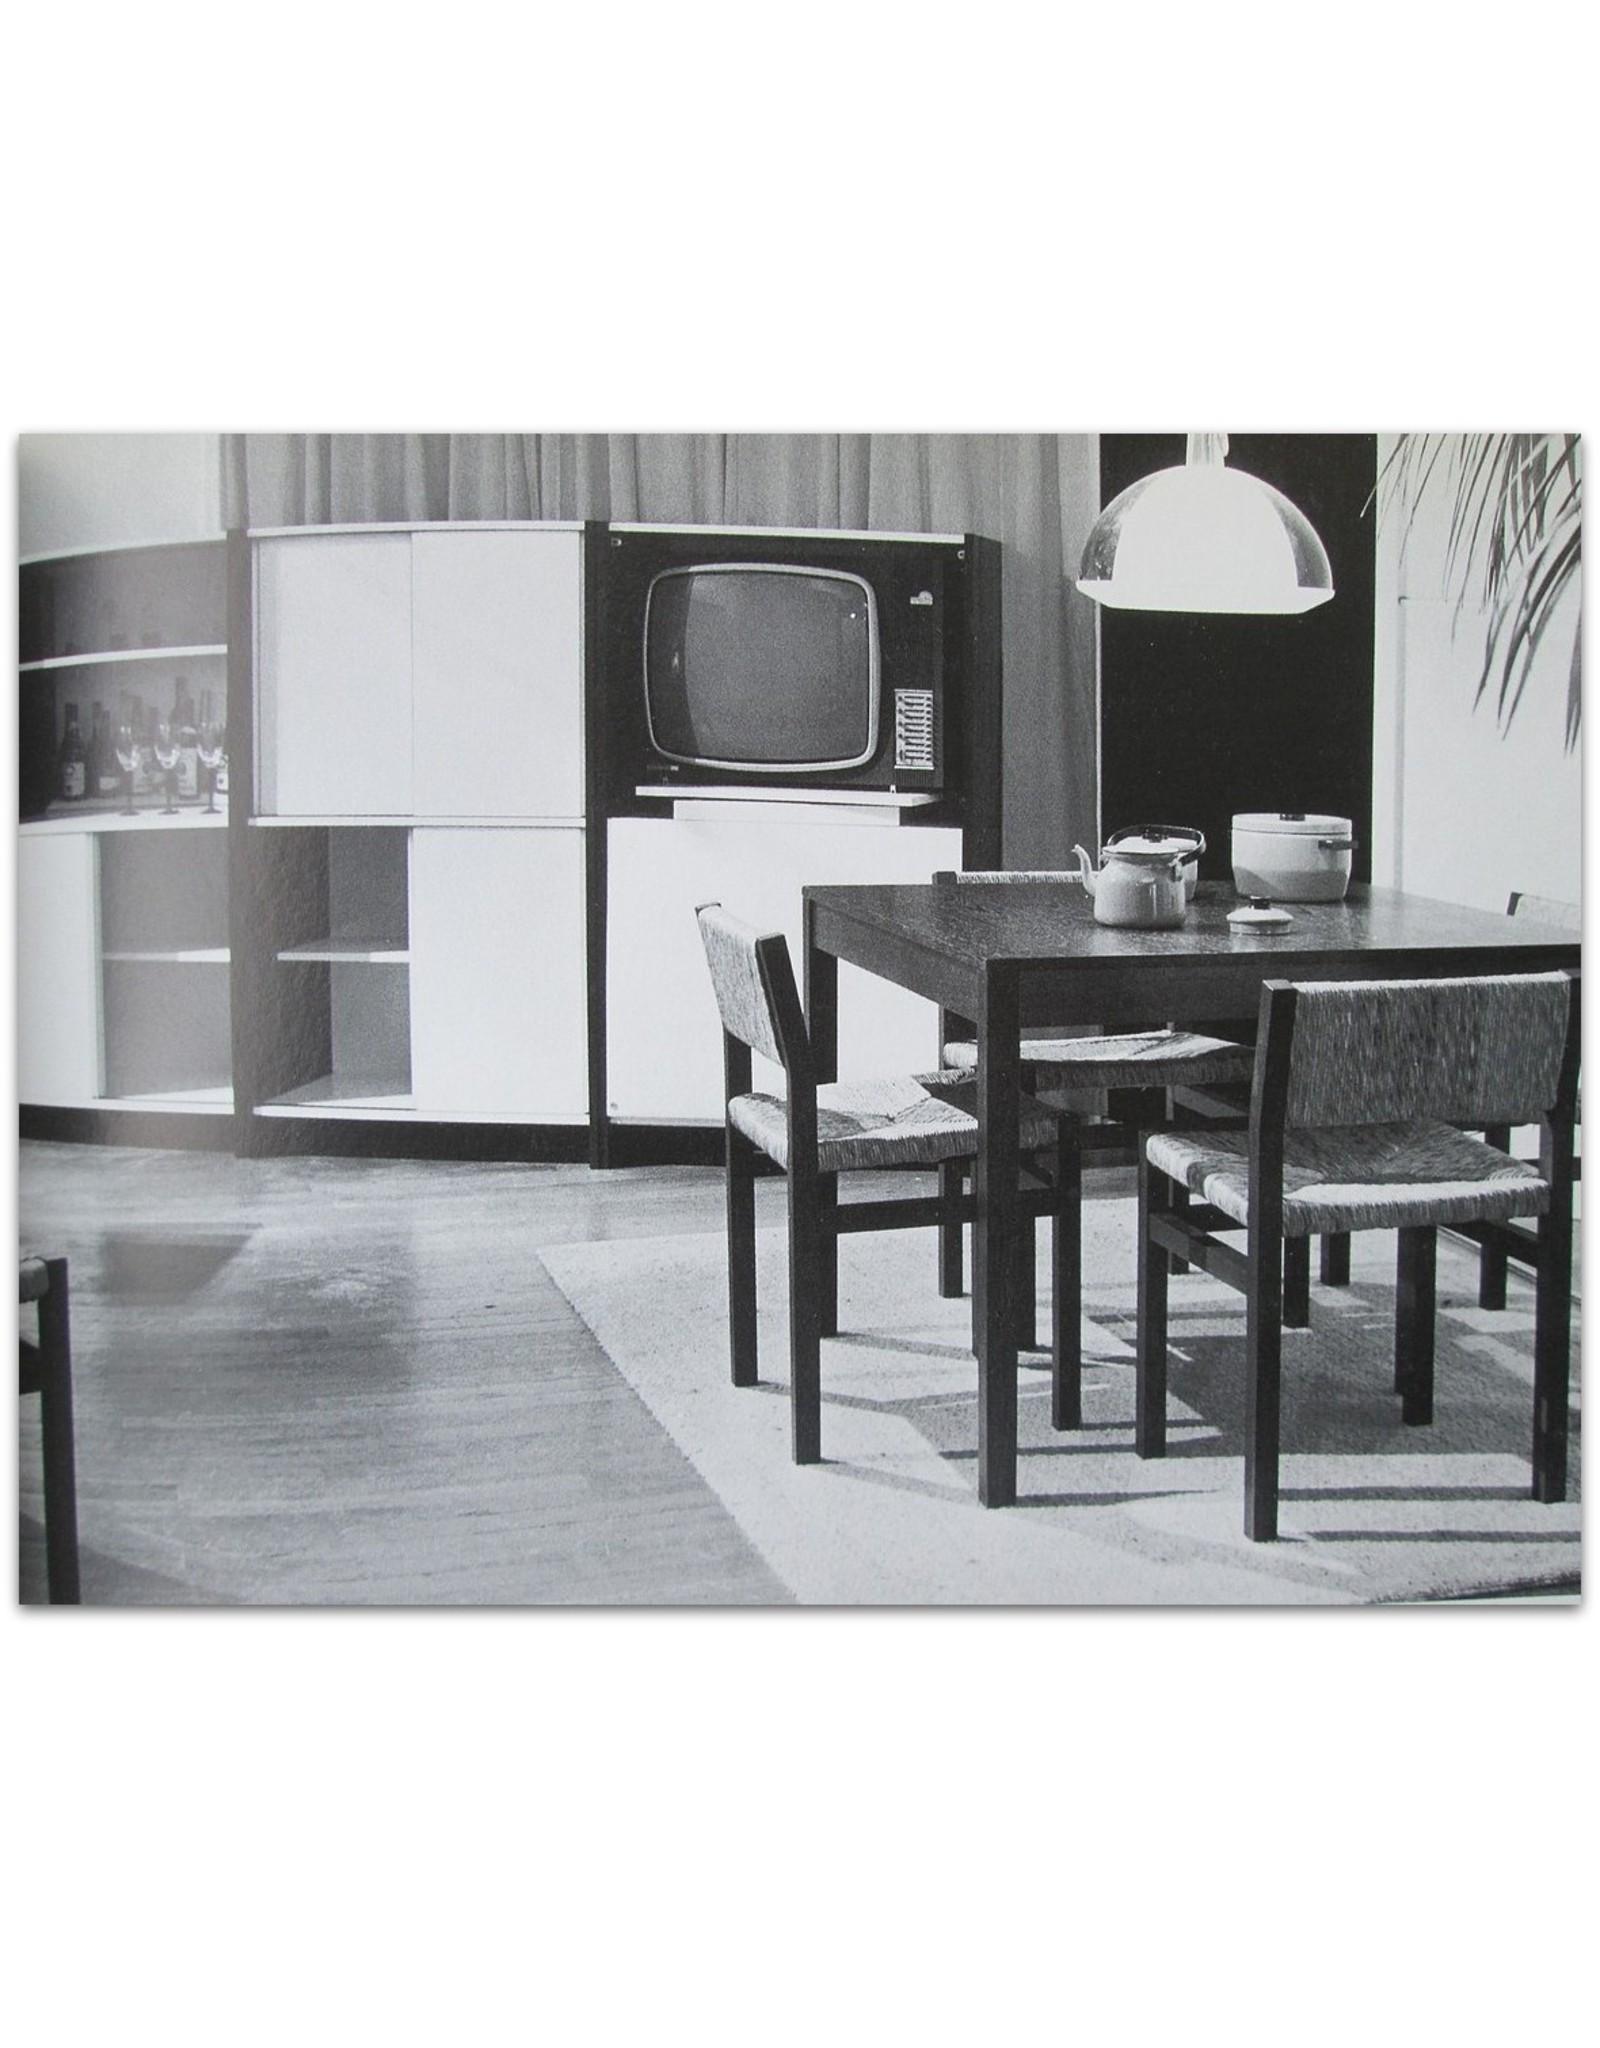 Jojanneke Clarijs - 't Spectrum. Moderne meubelvormgeving en naoorlogs idealisme